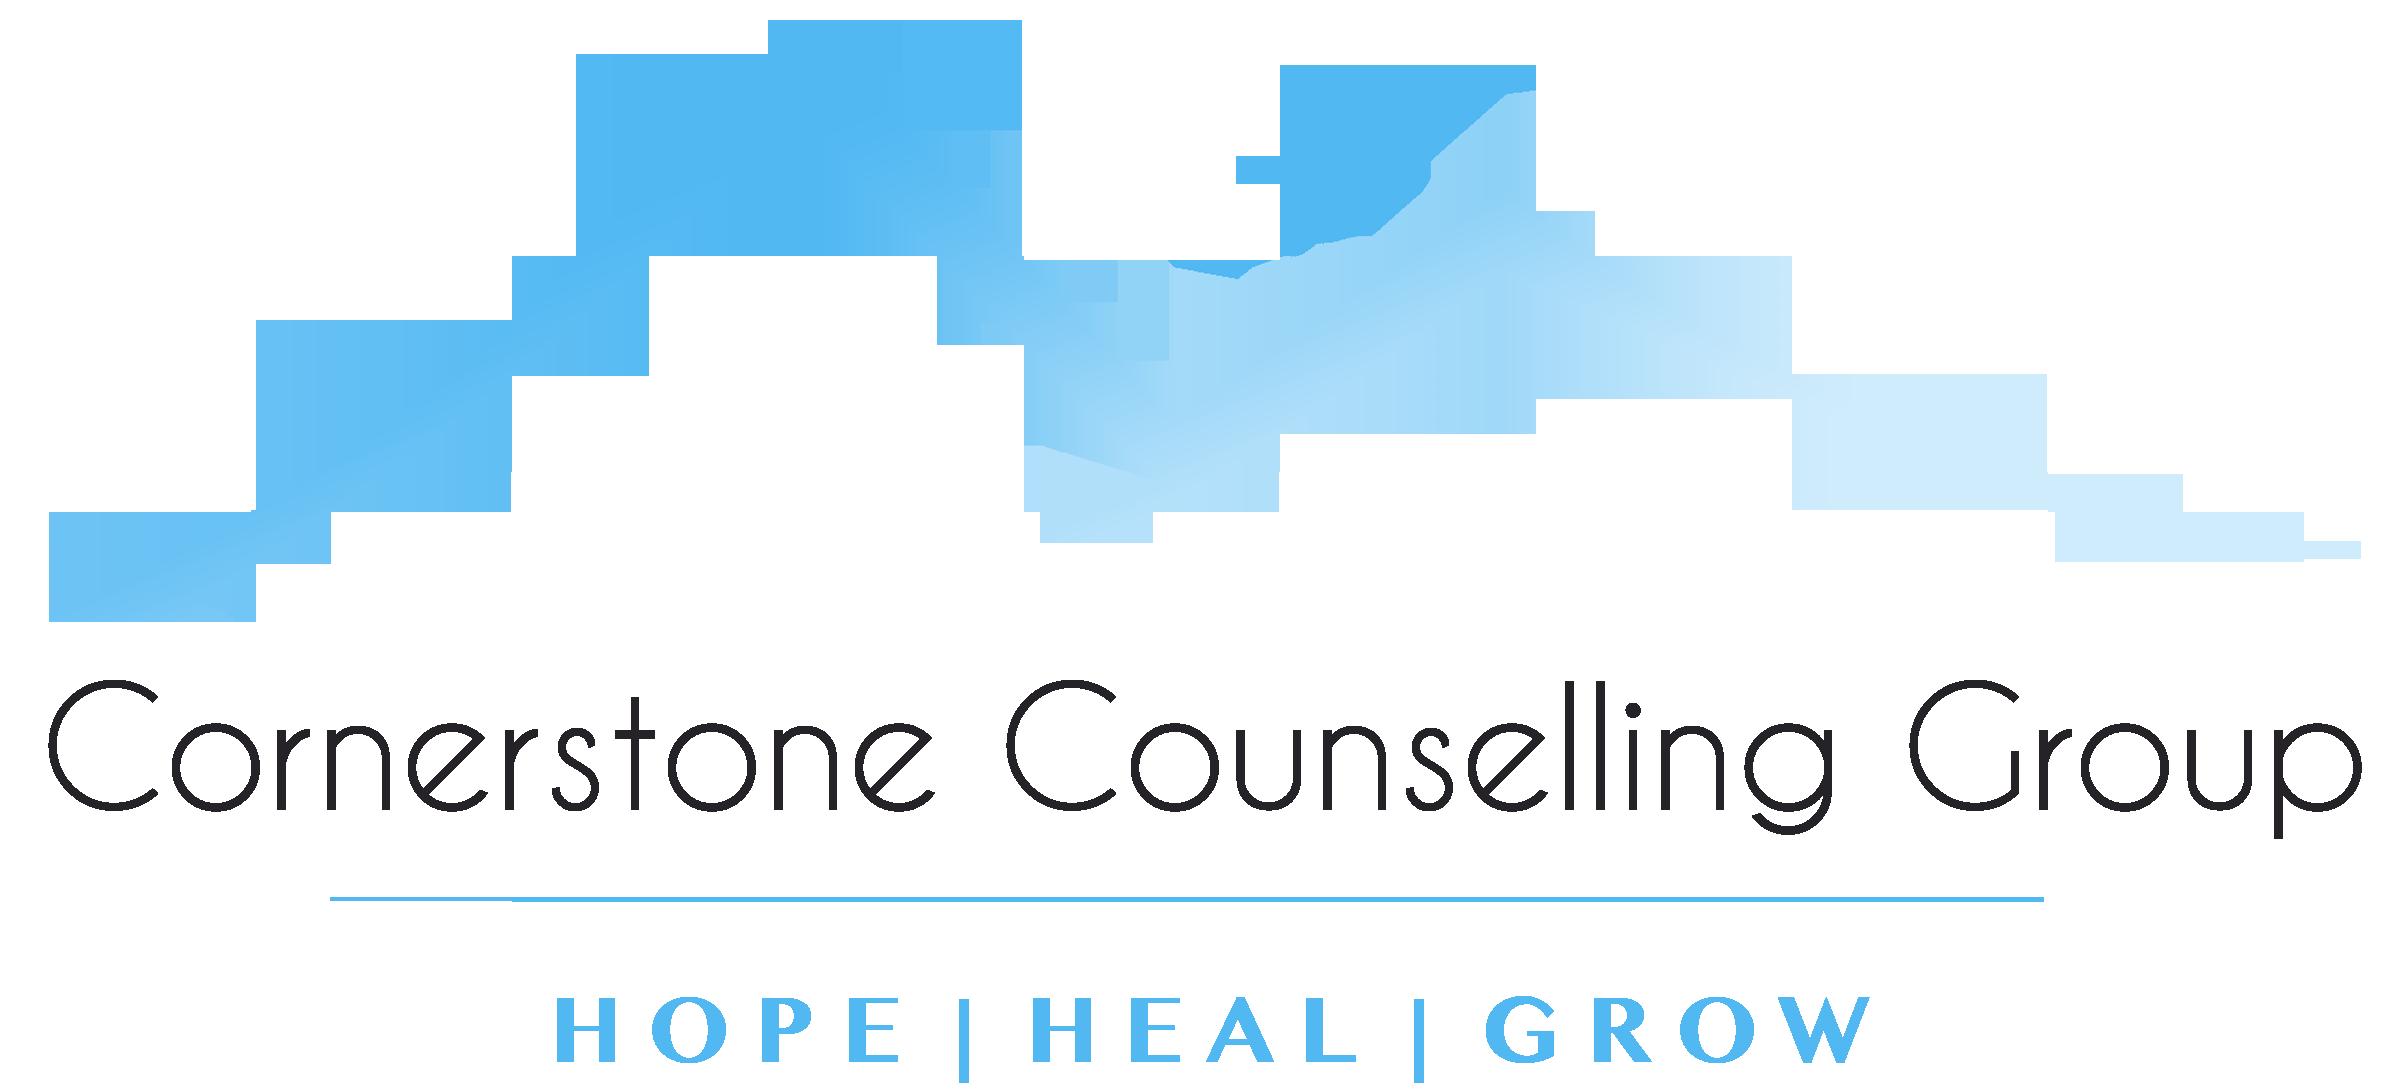 Cornerstone Counselling Group